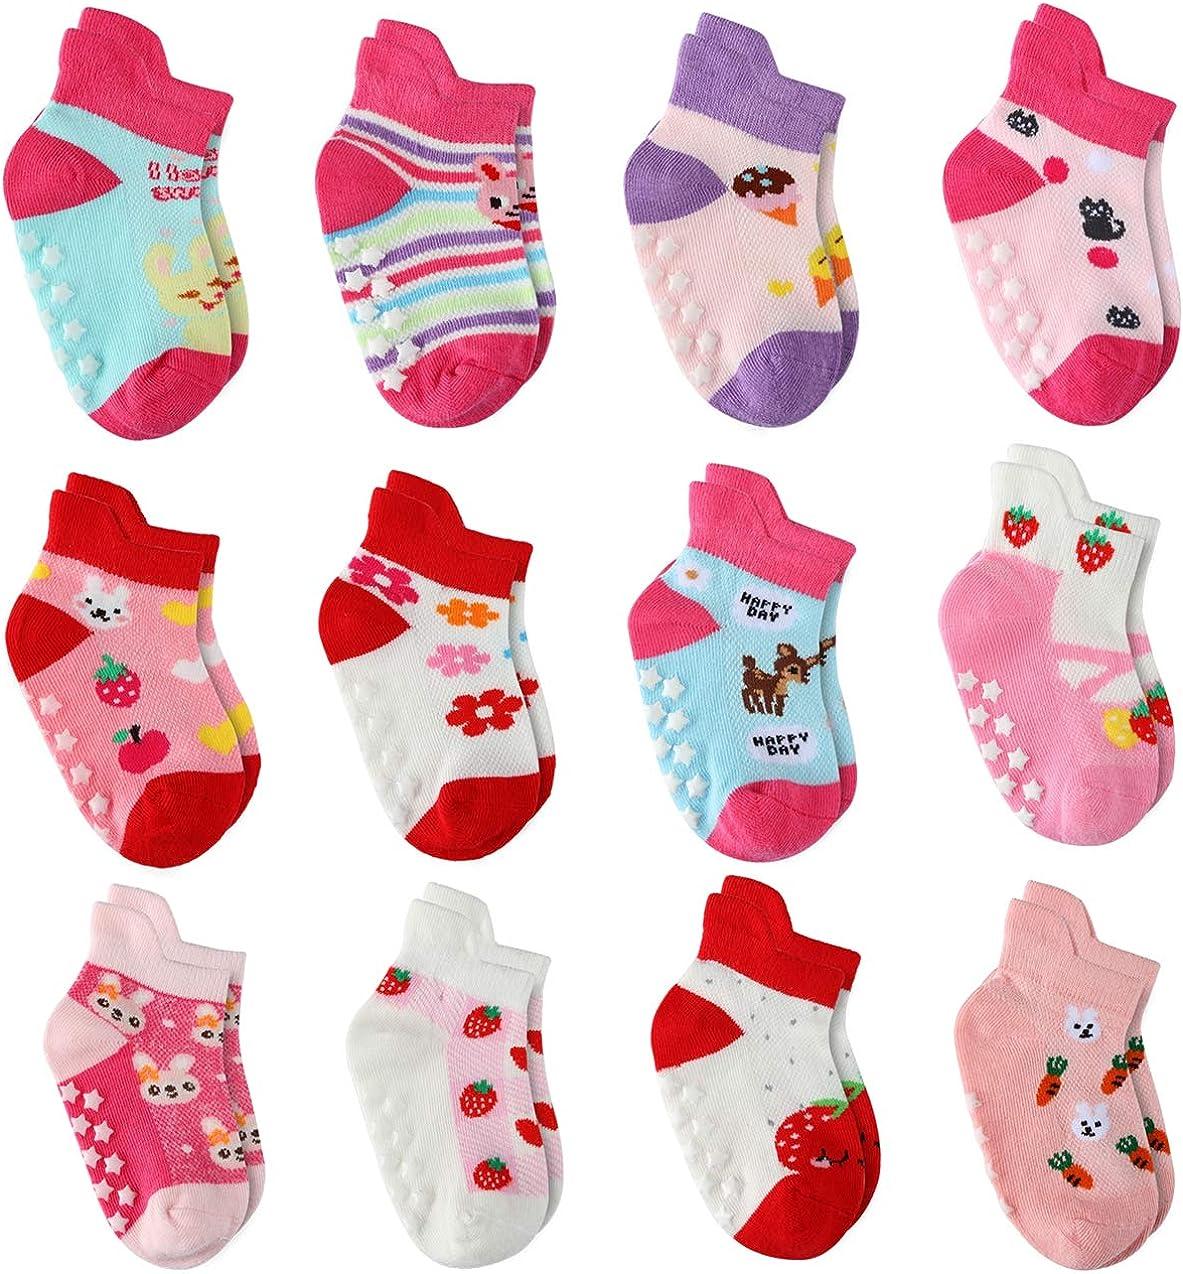 12 Pairs Toddler Girl Non Skid Socks Cute Cotton with Grips Baby Girls Anti-skid Socks